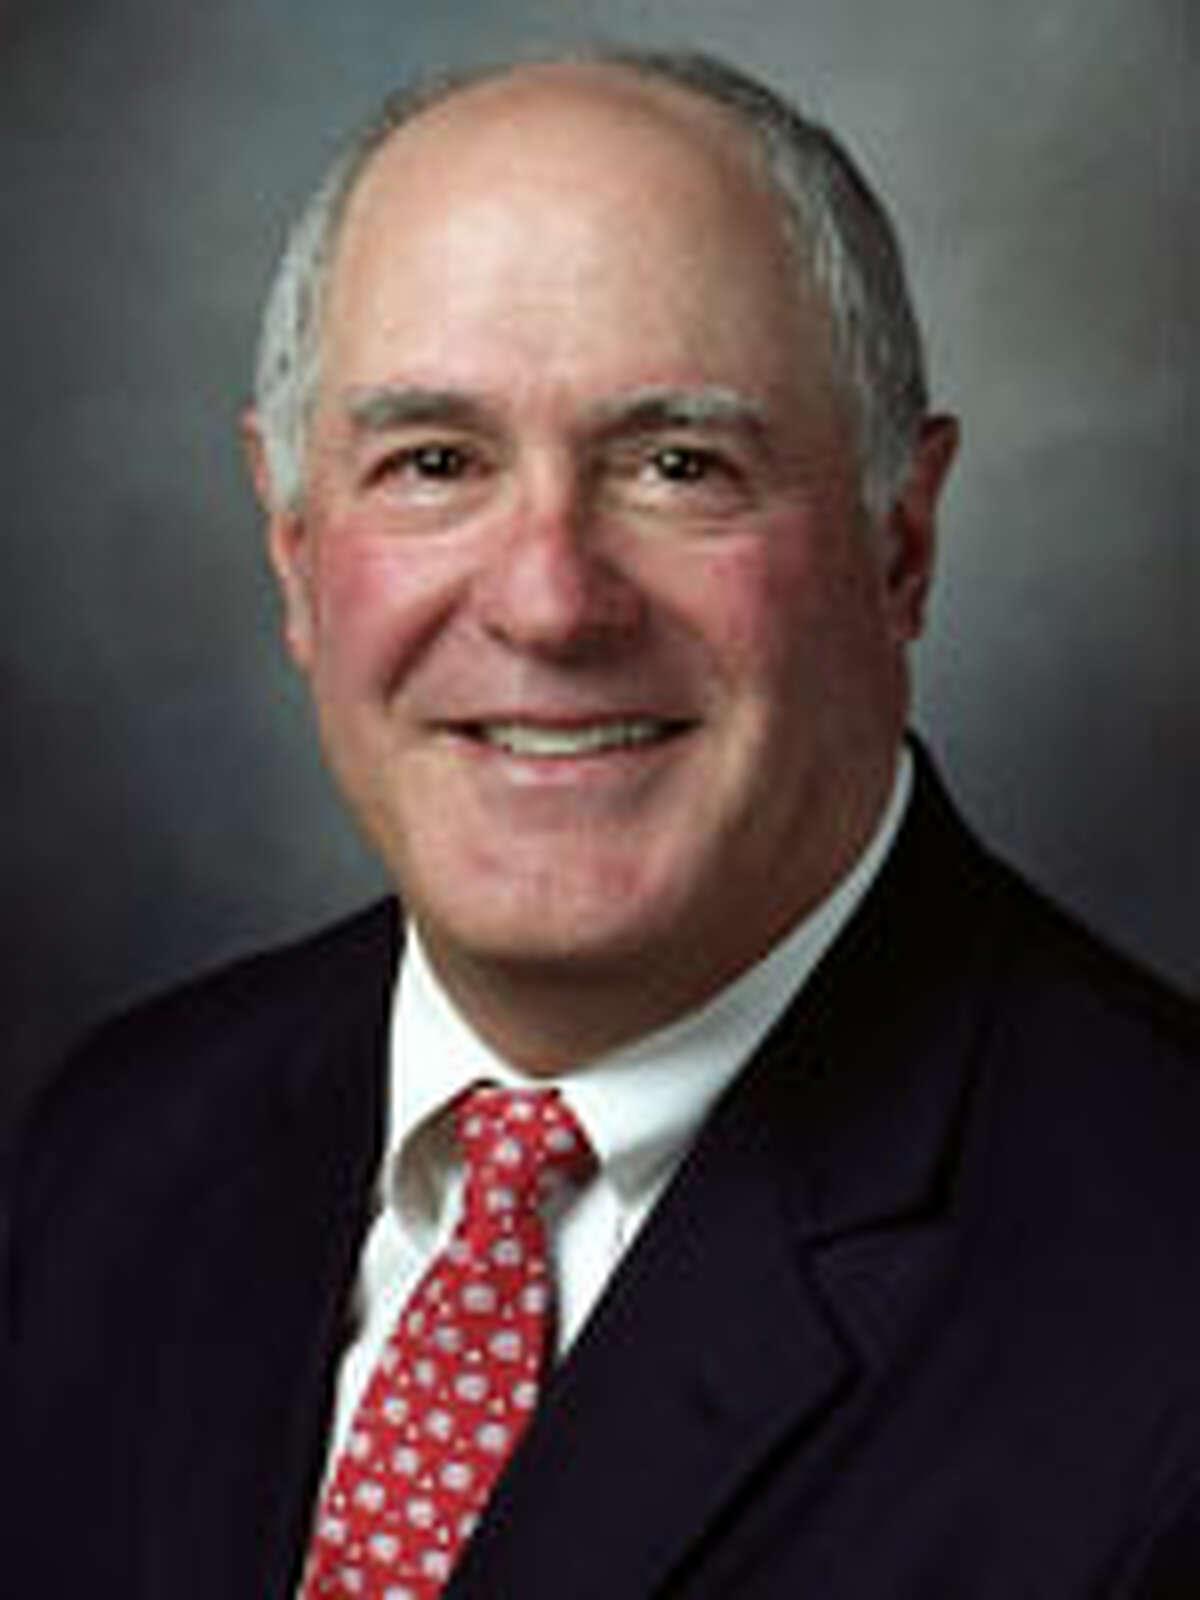 19. Kelton G. Seliger (Texas Senator) City: Amarillo Party: Republican Cash on hand: $1.57 million Source:Texas Tribune